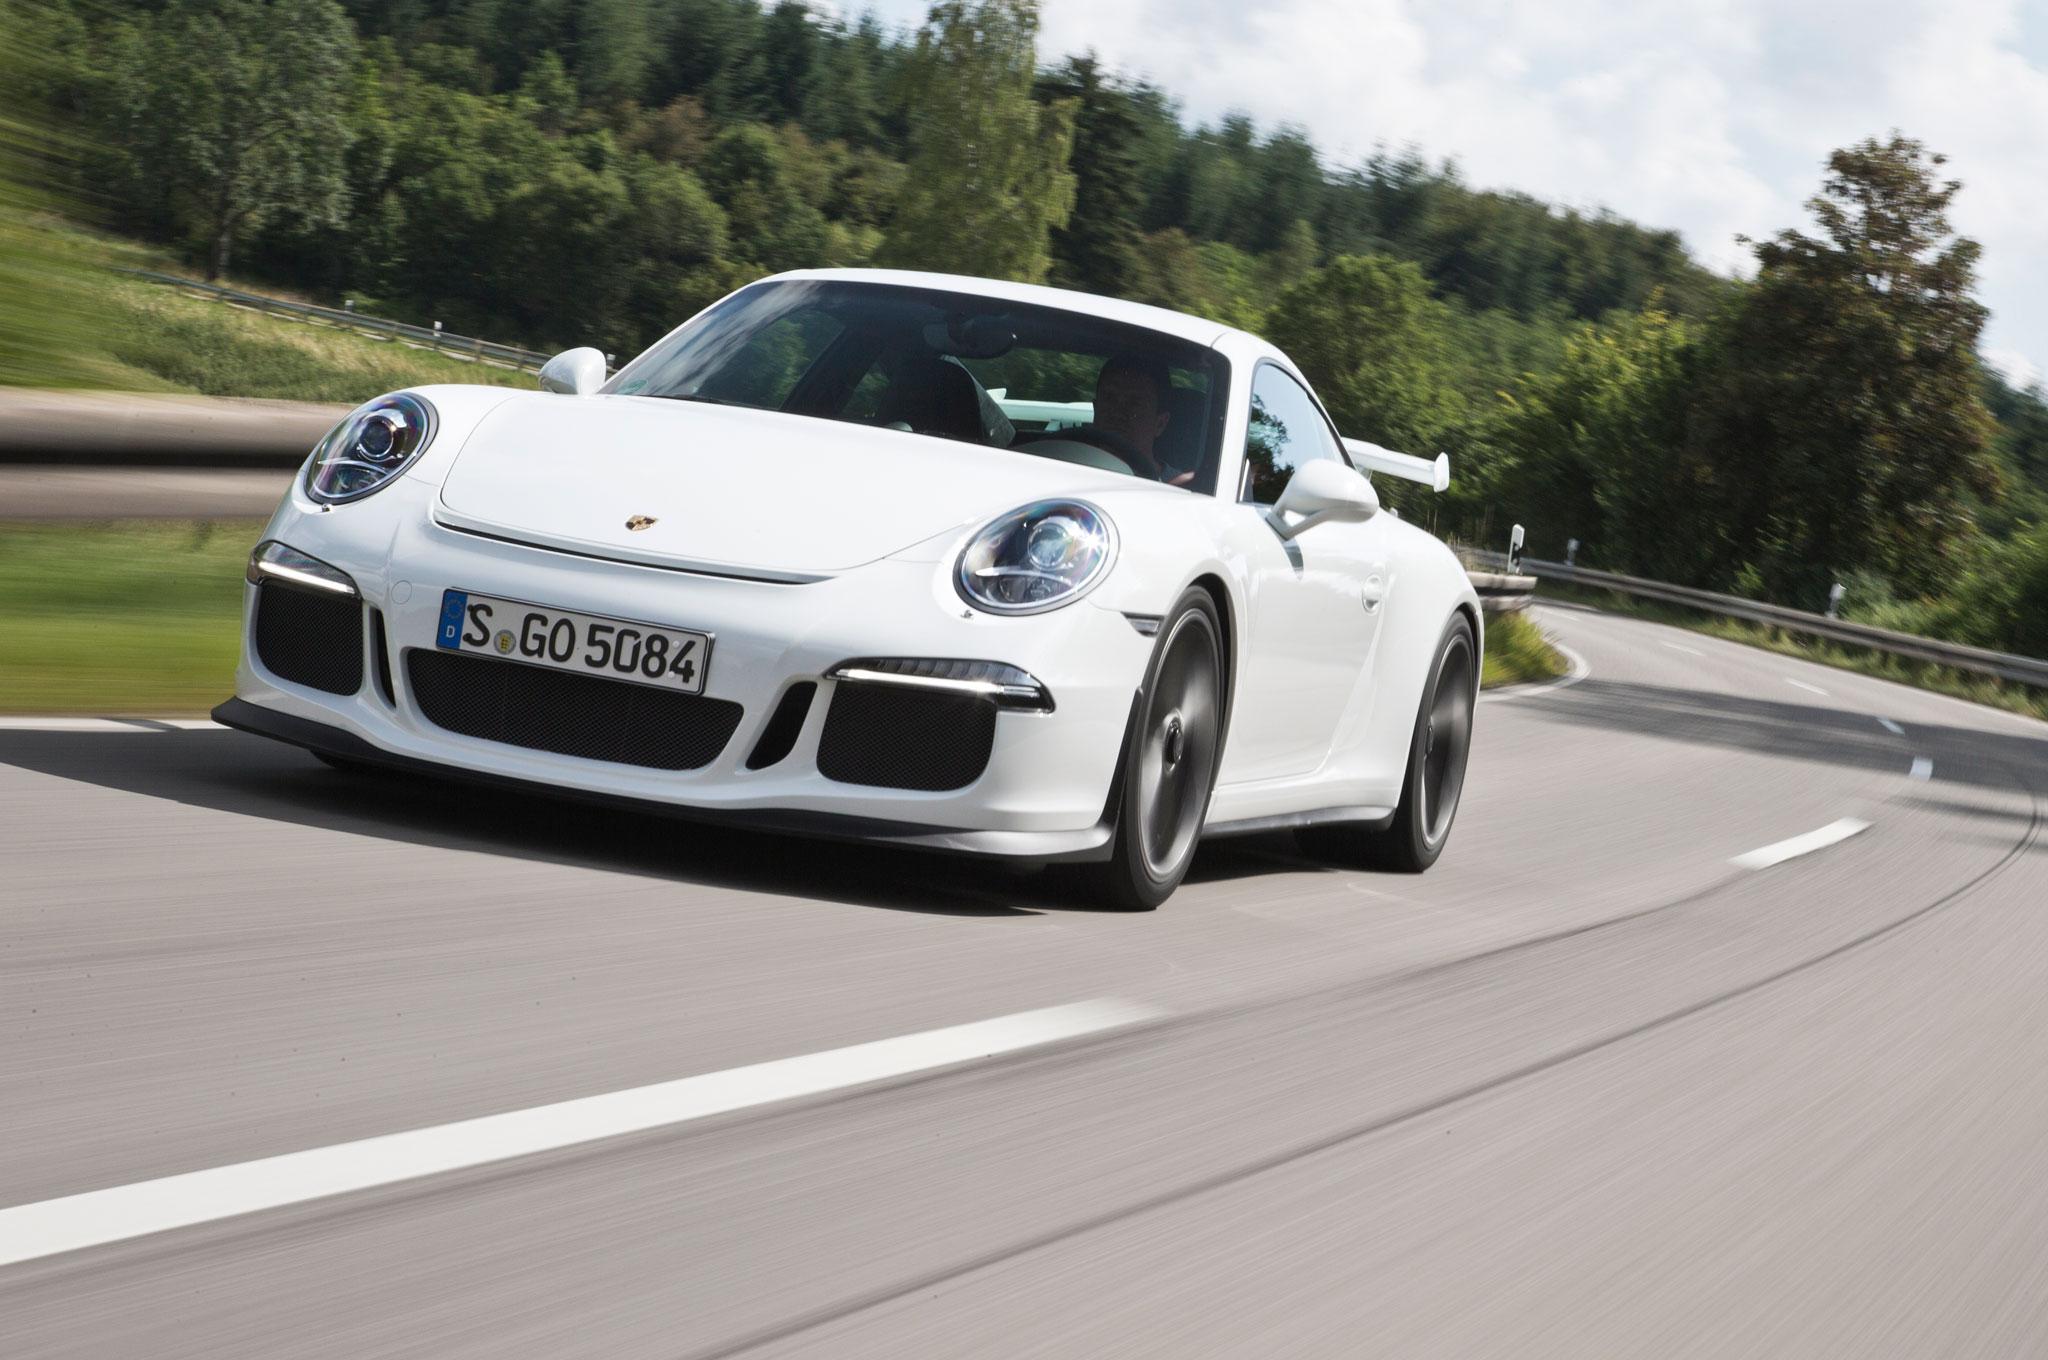 ls-model 911 25 2014 Porsche 911 GT3